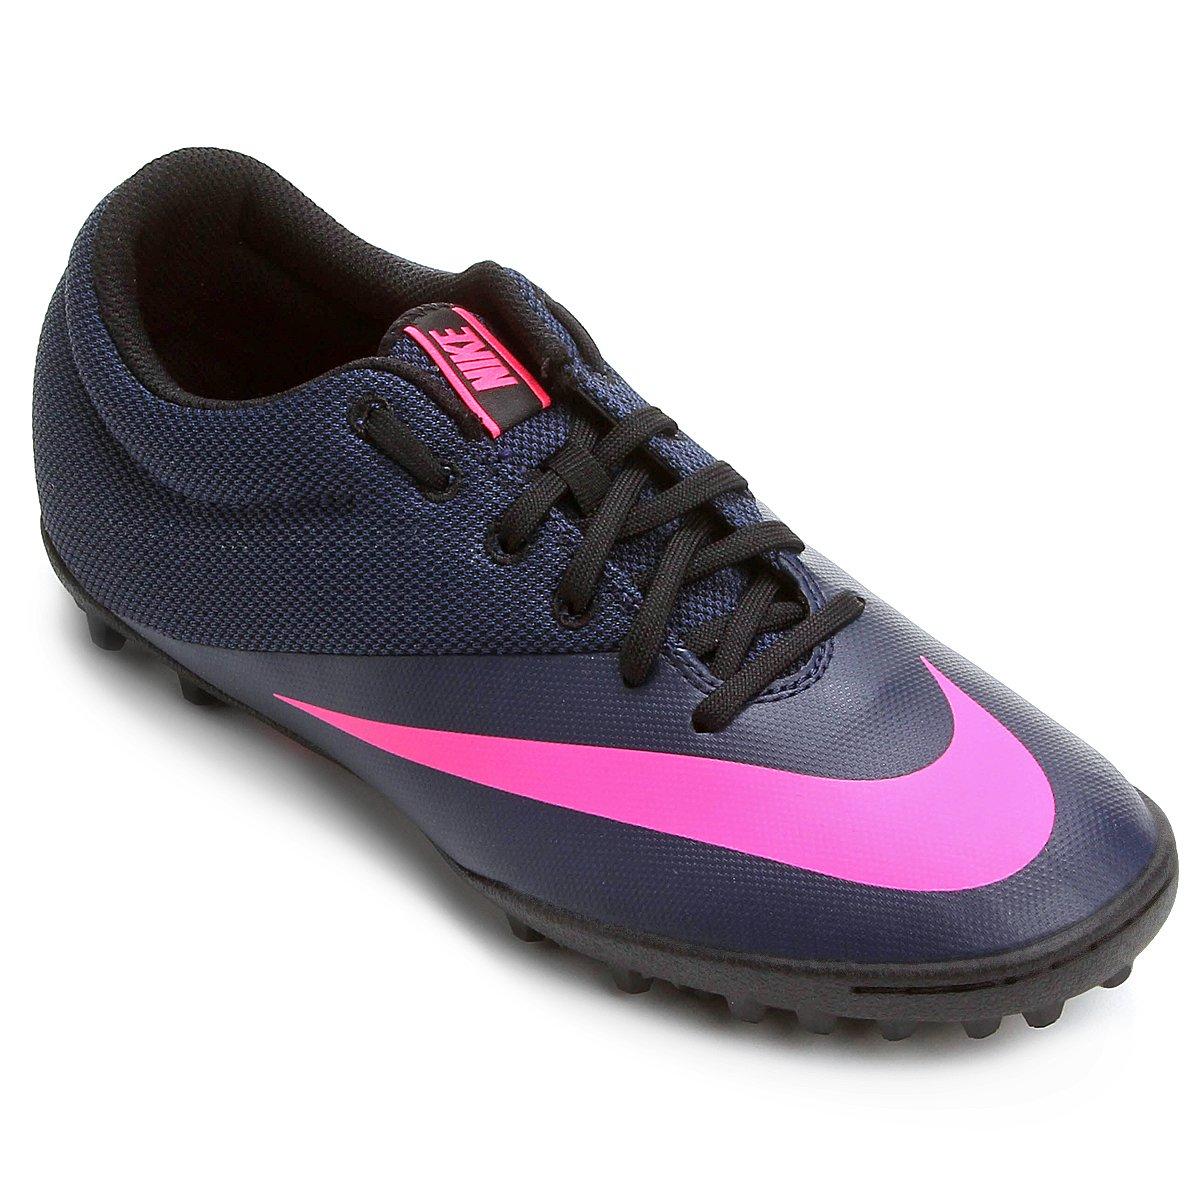 Chuteira Nike Mercurial Pro TF Society - Compre Agora  8c73bd56b274a